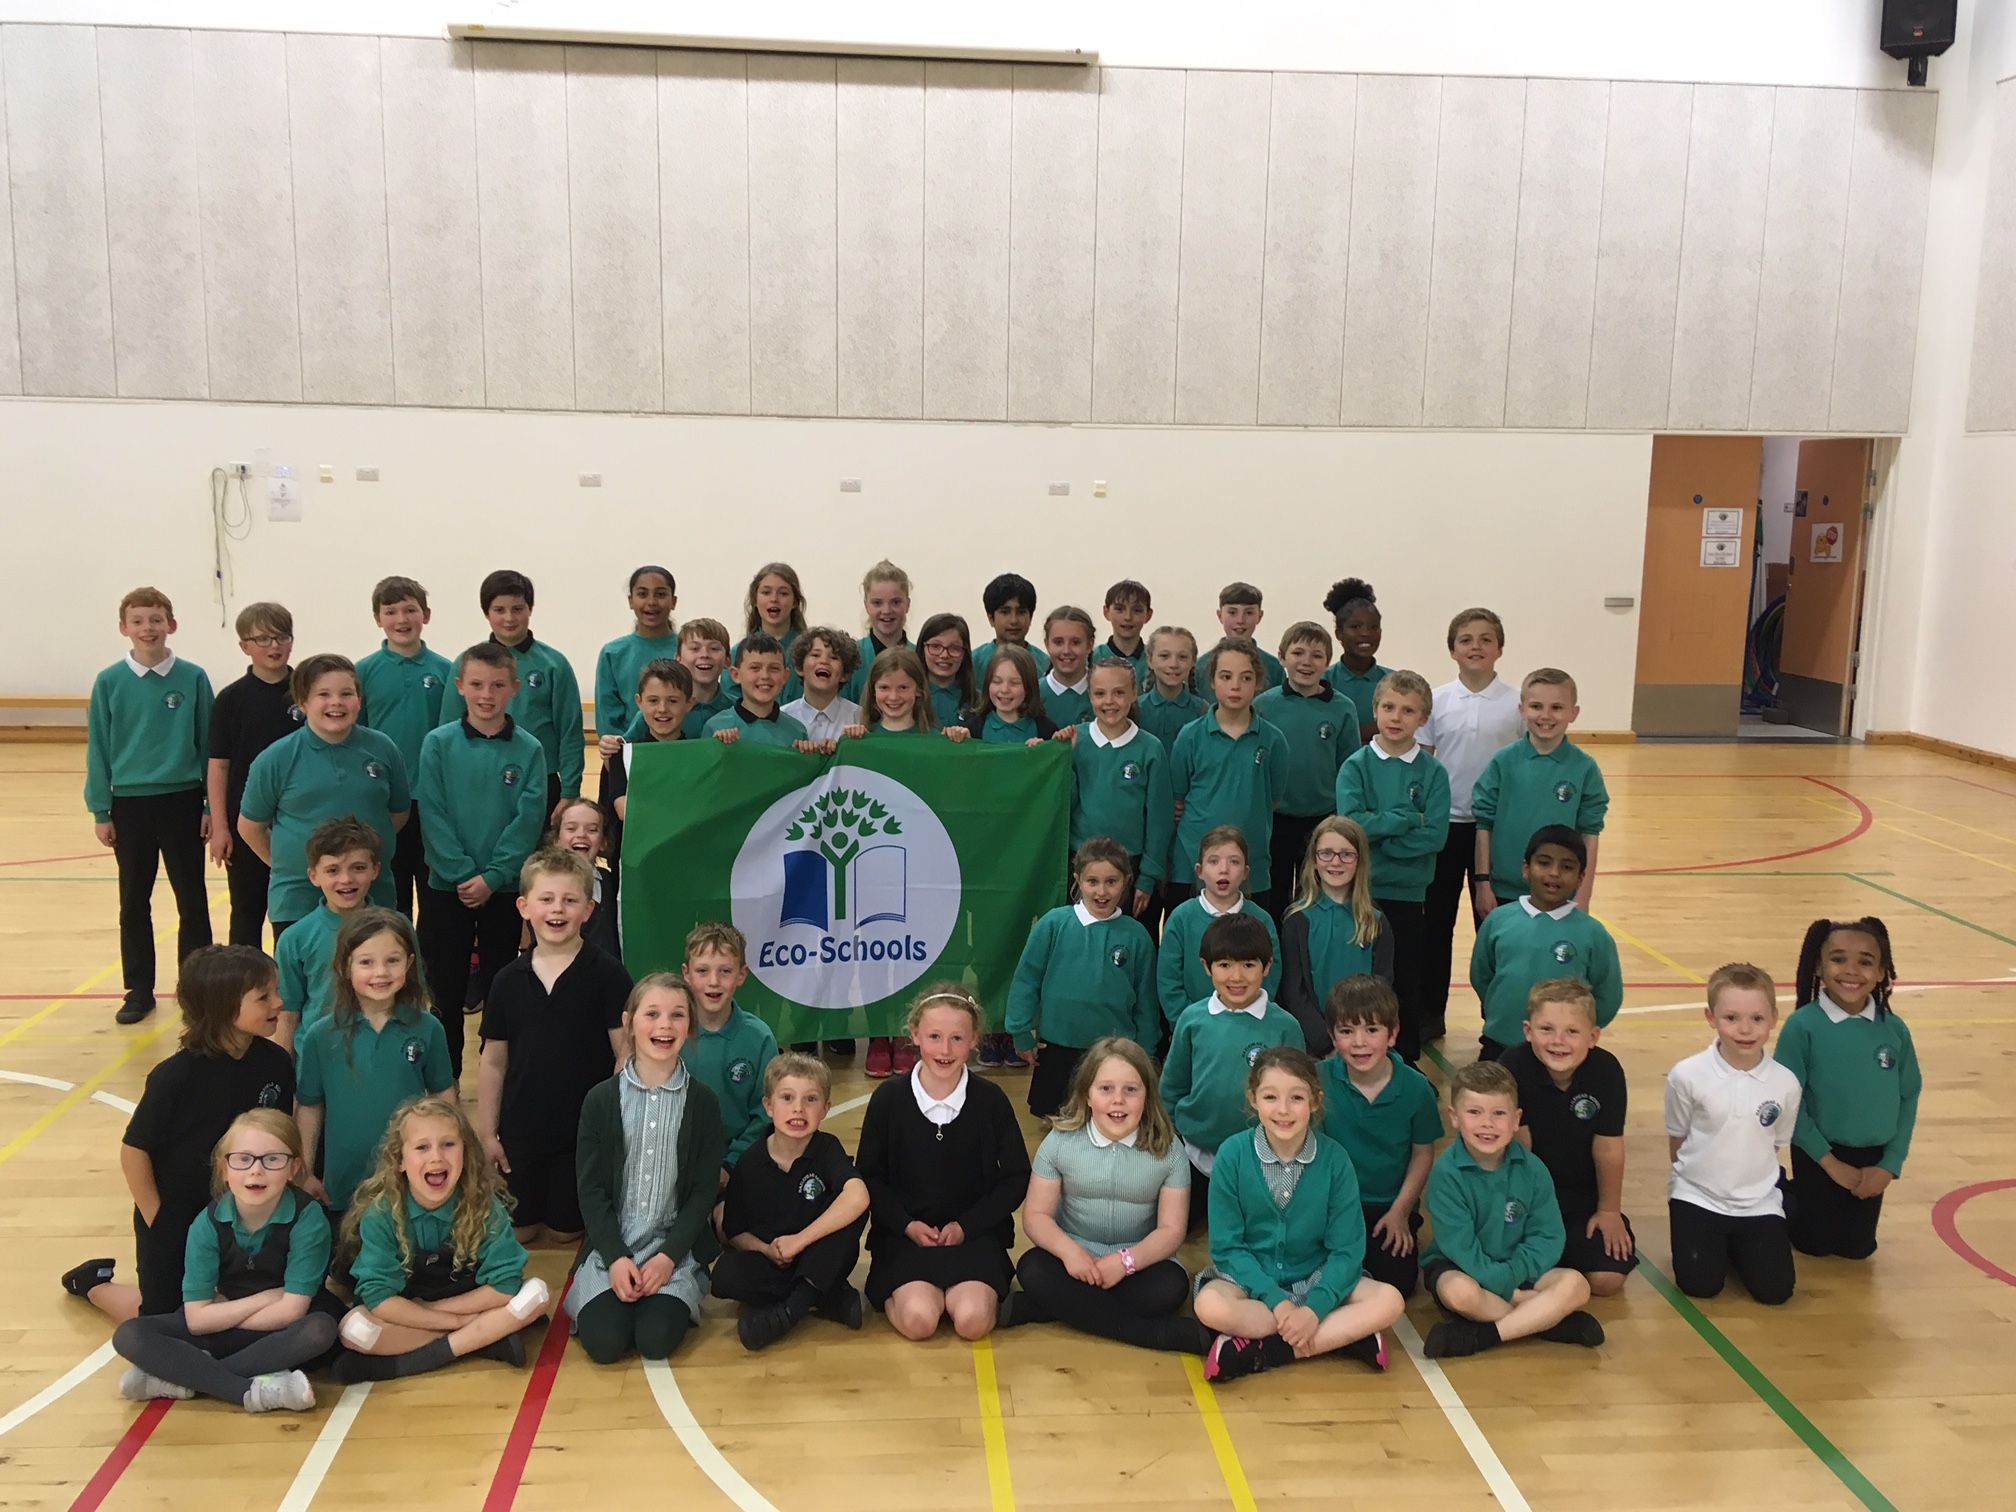 Hazlehead School pupils proudly show off their third Green Flag award